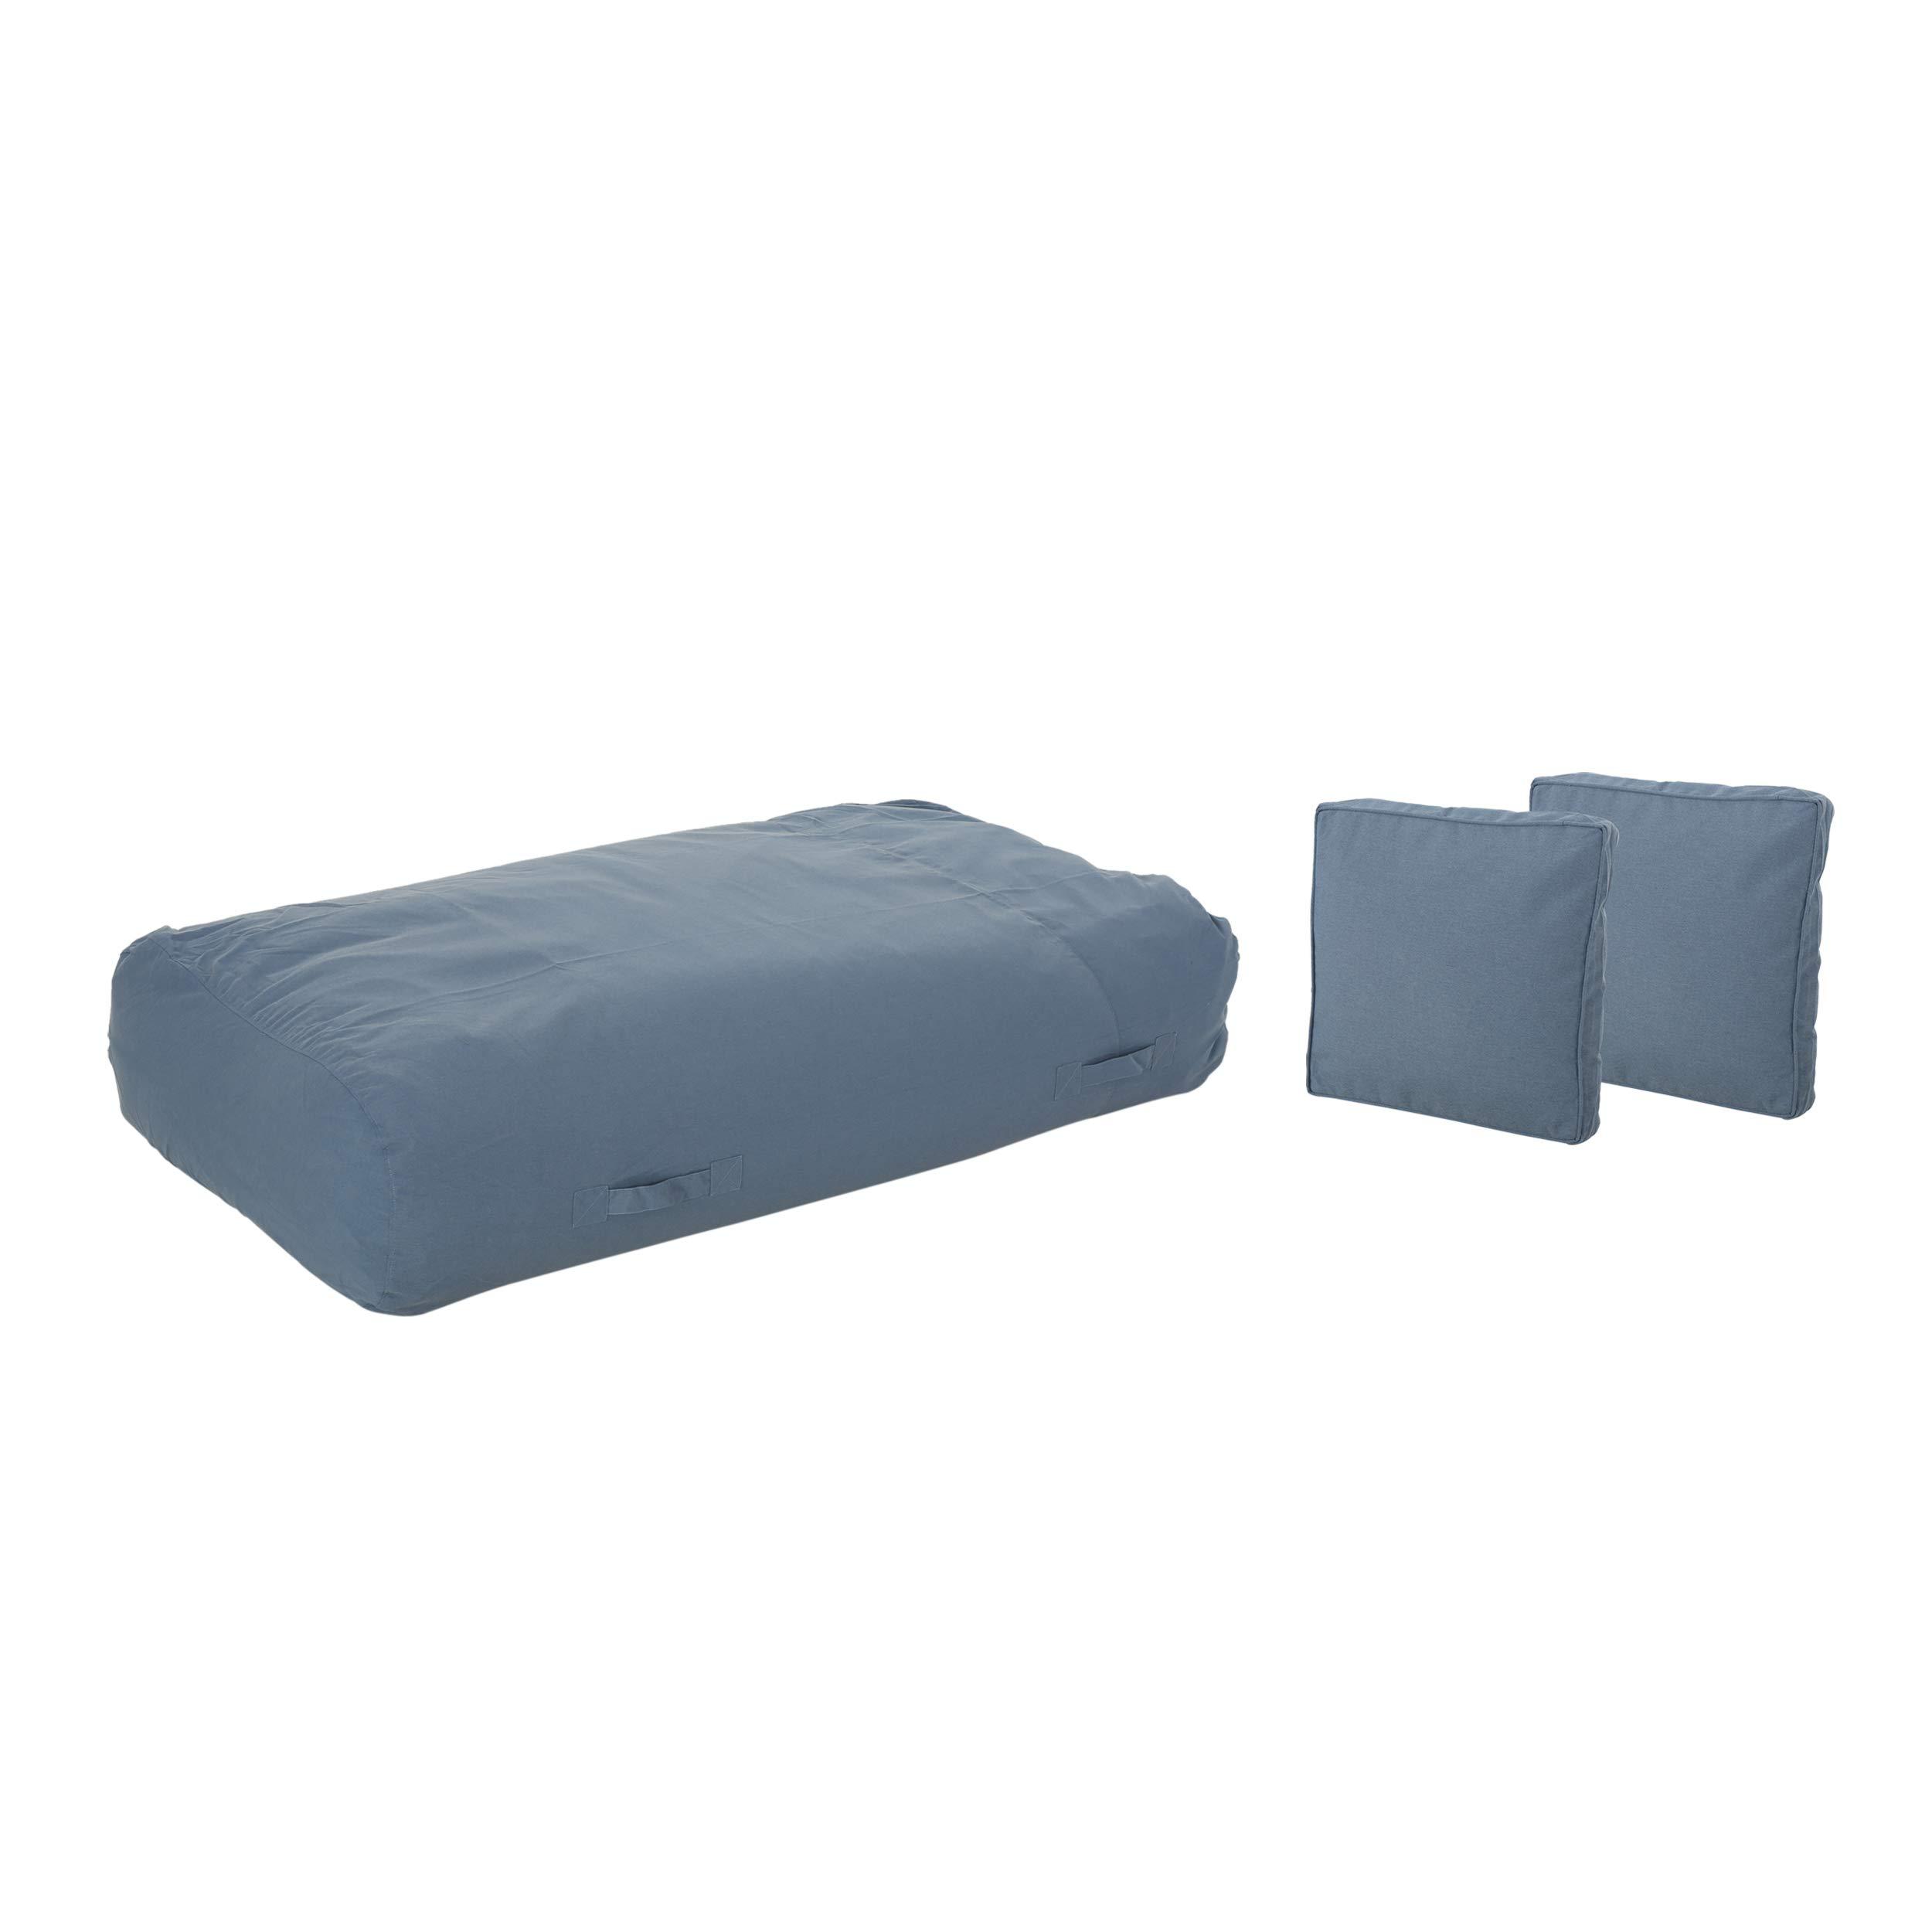 Great Deal Furniture Vivien Outdoor Water Resistant 6'x3' Lounger Bean Bag and 18'' Throw Pillows Set, Blue